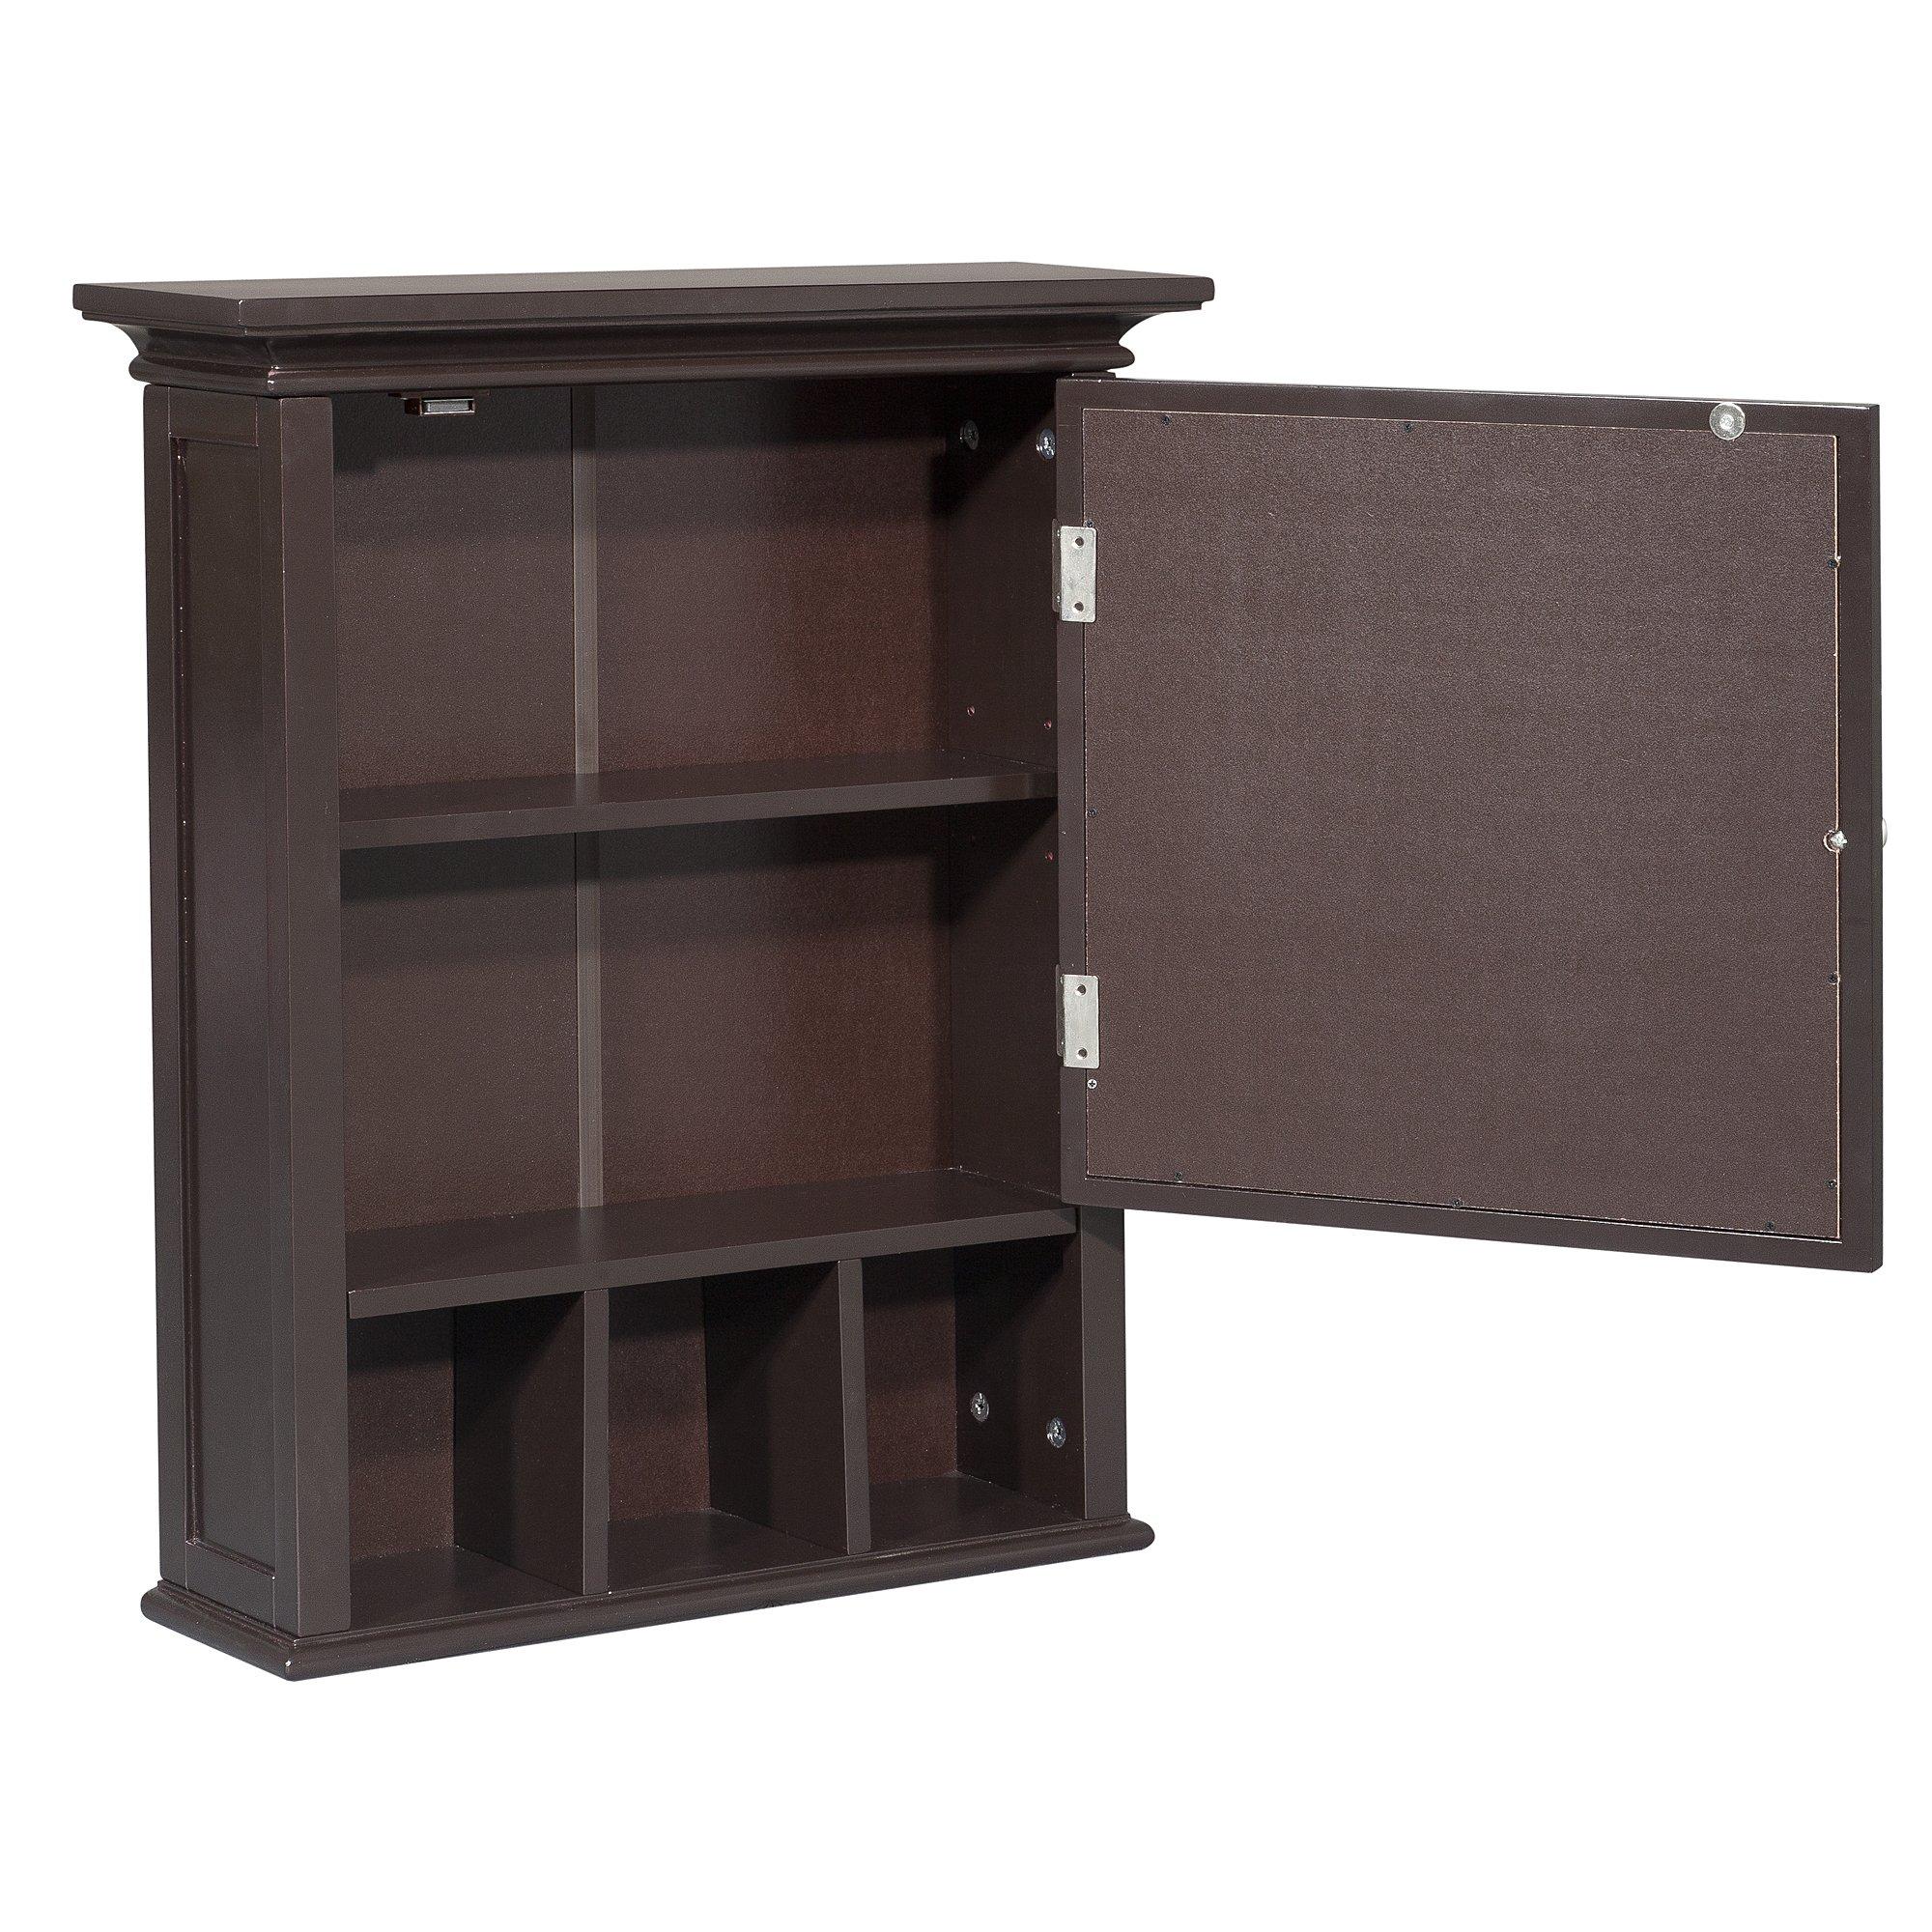 Elegant Home Fashion Neal Medicine Cabinet by Elegant Home Fashion (Image #6)